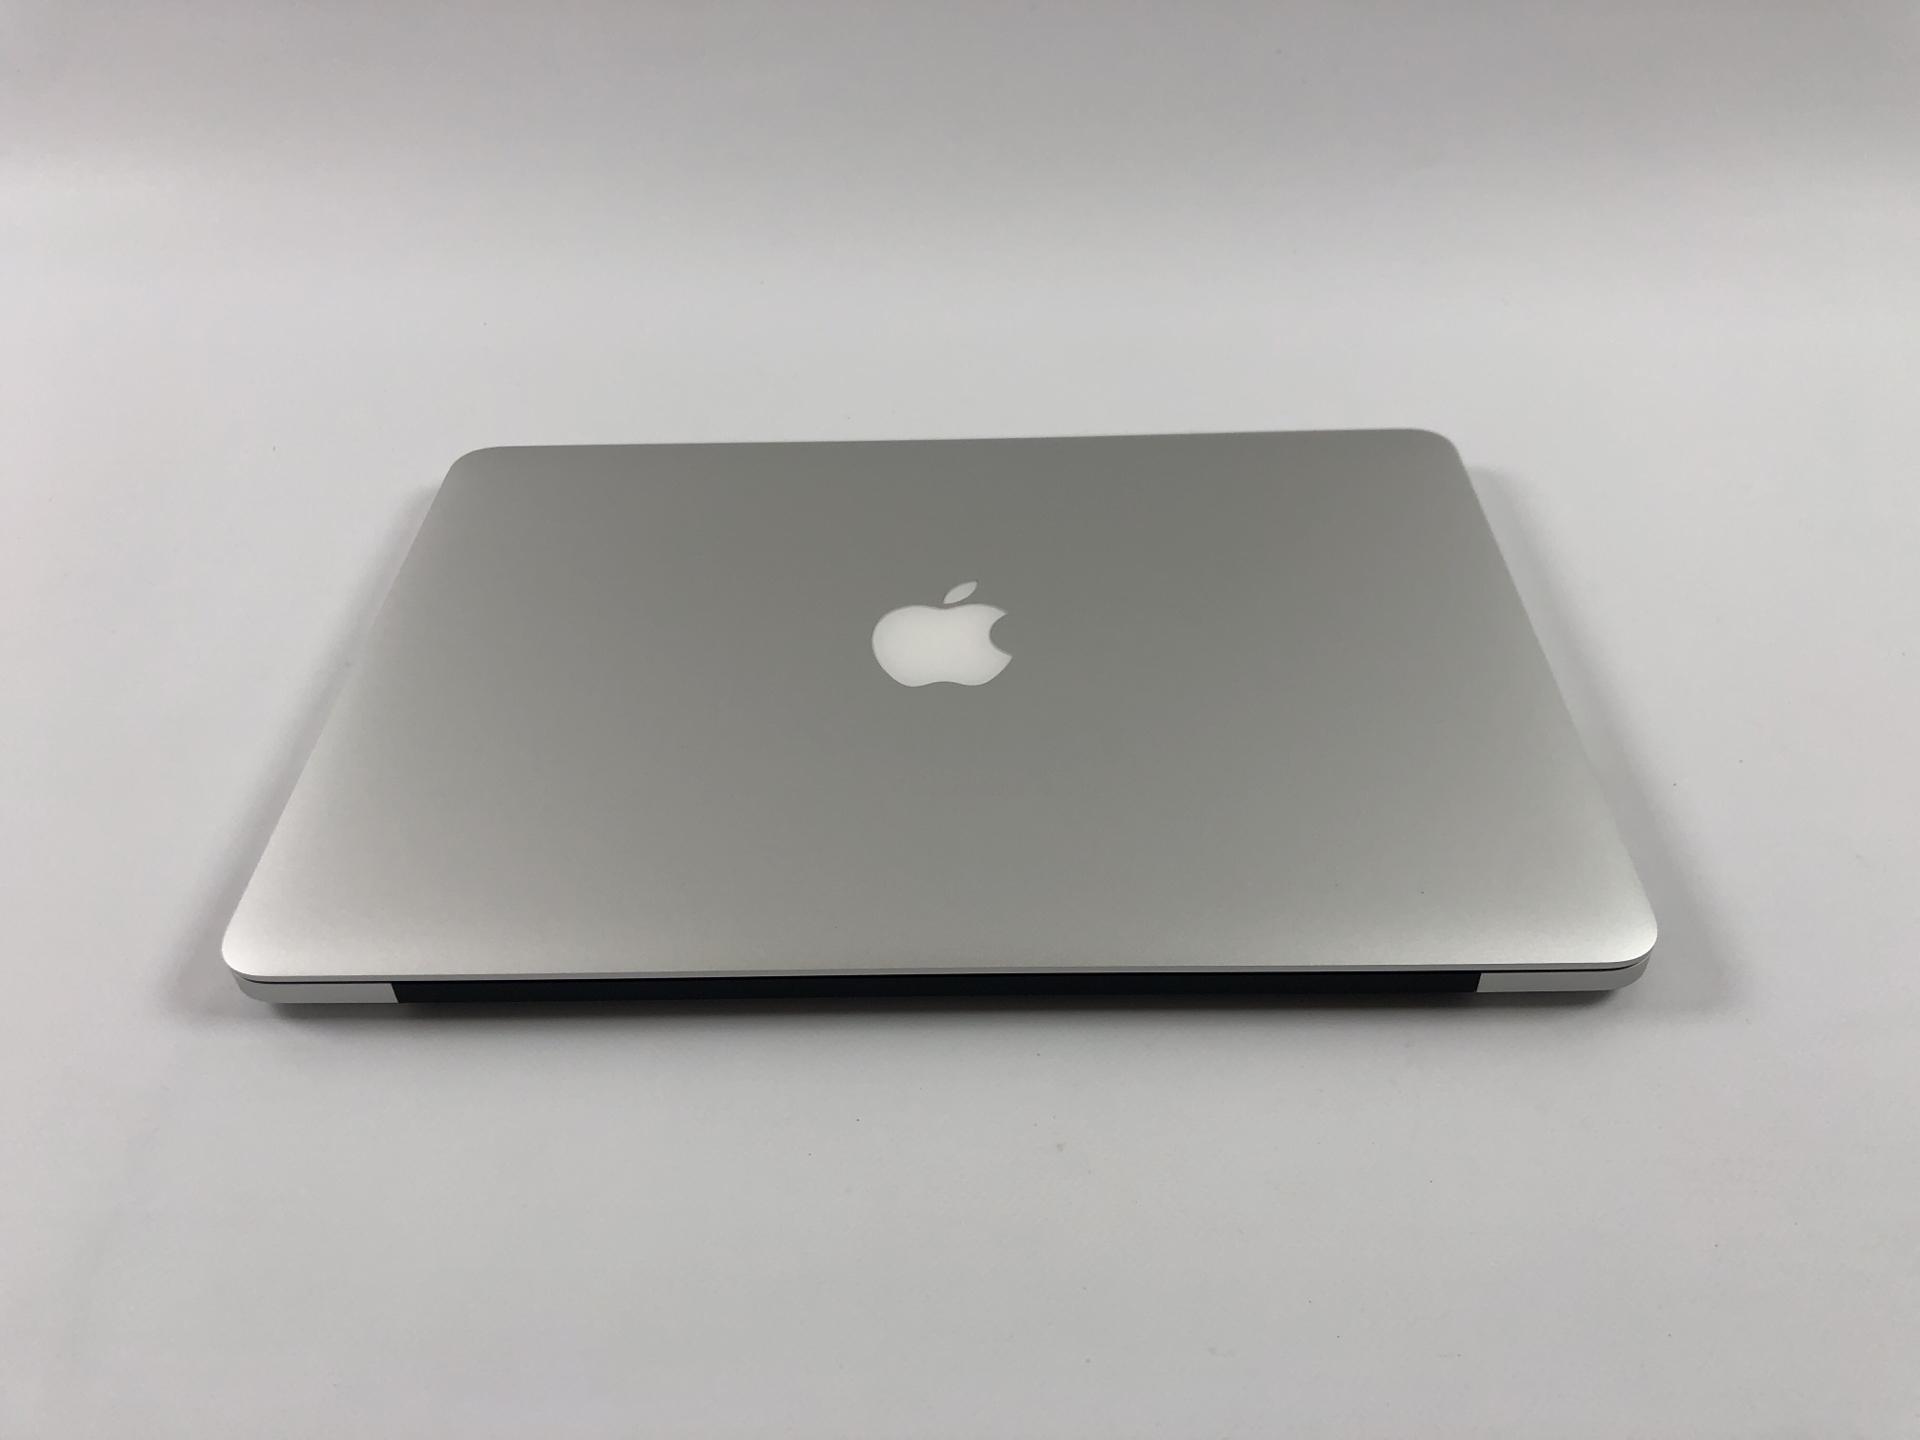 "MacBook Pro Retina 13"" Early 2015 (Intel Core i5 2.9 GHz 8 GB RAM 256 GB SSD), Intel Core i5 2.9 GHz, 8 GB RAM, 256 GB SSD, bild 2"